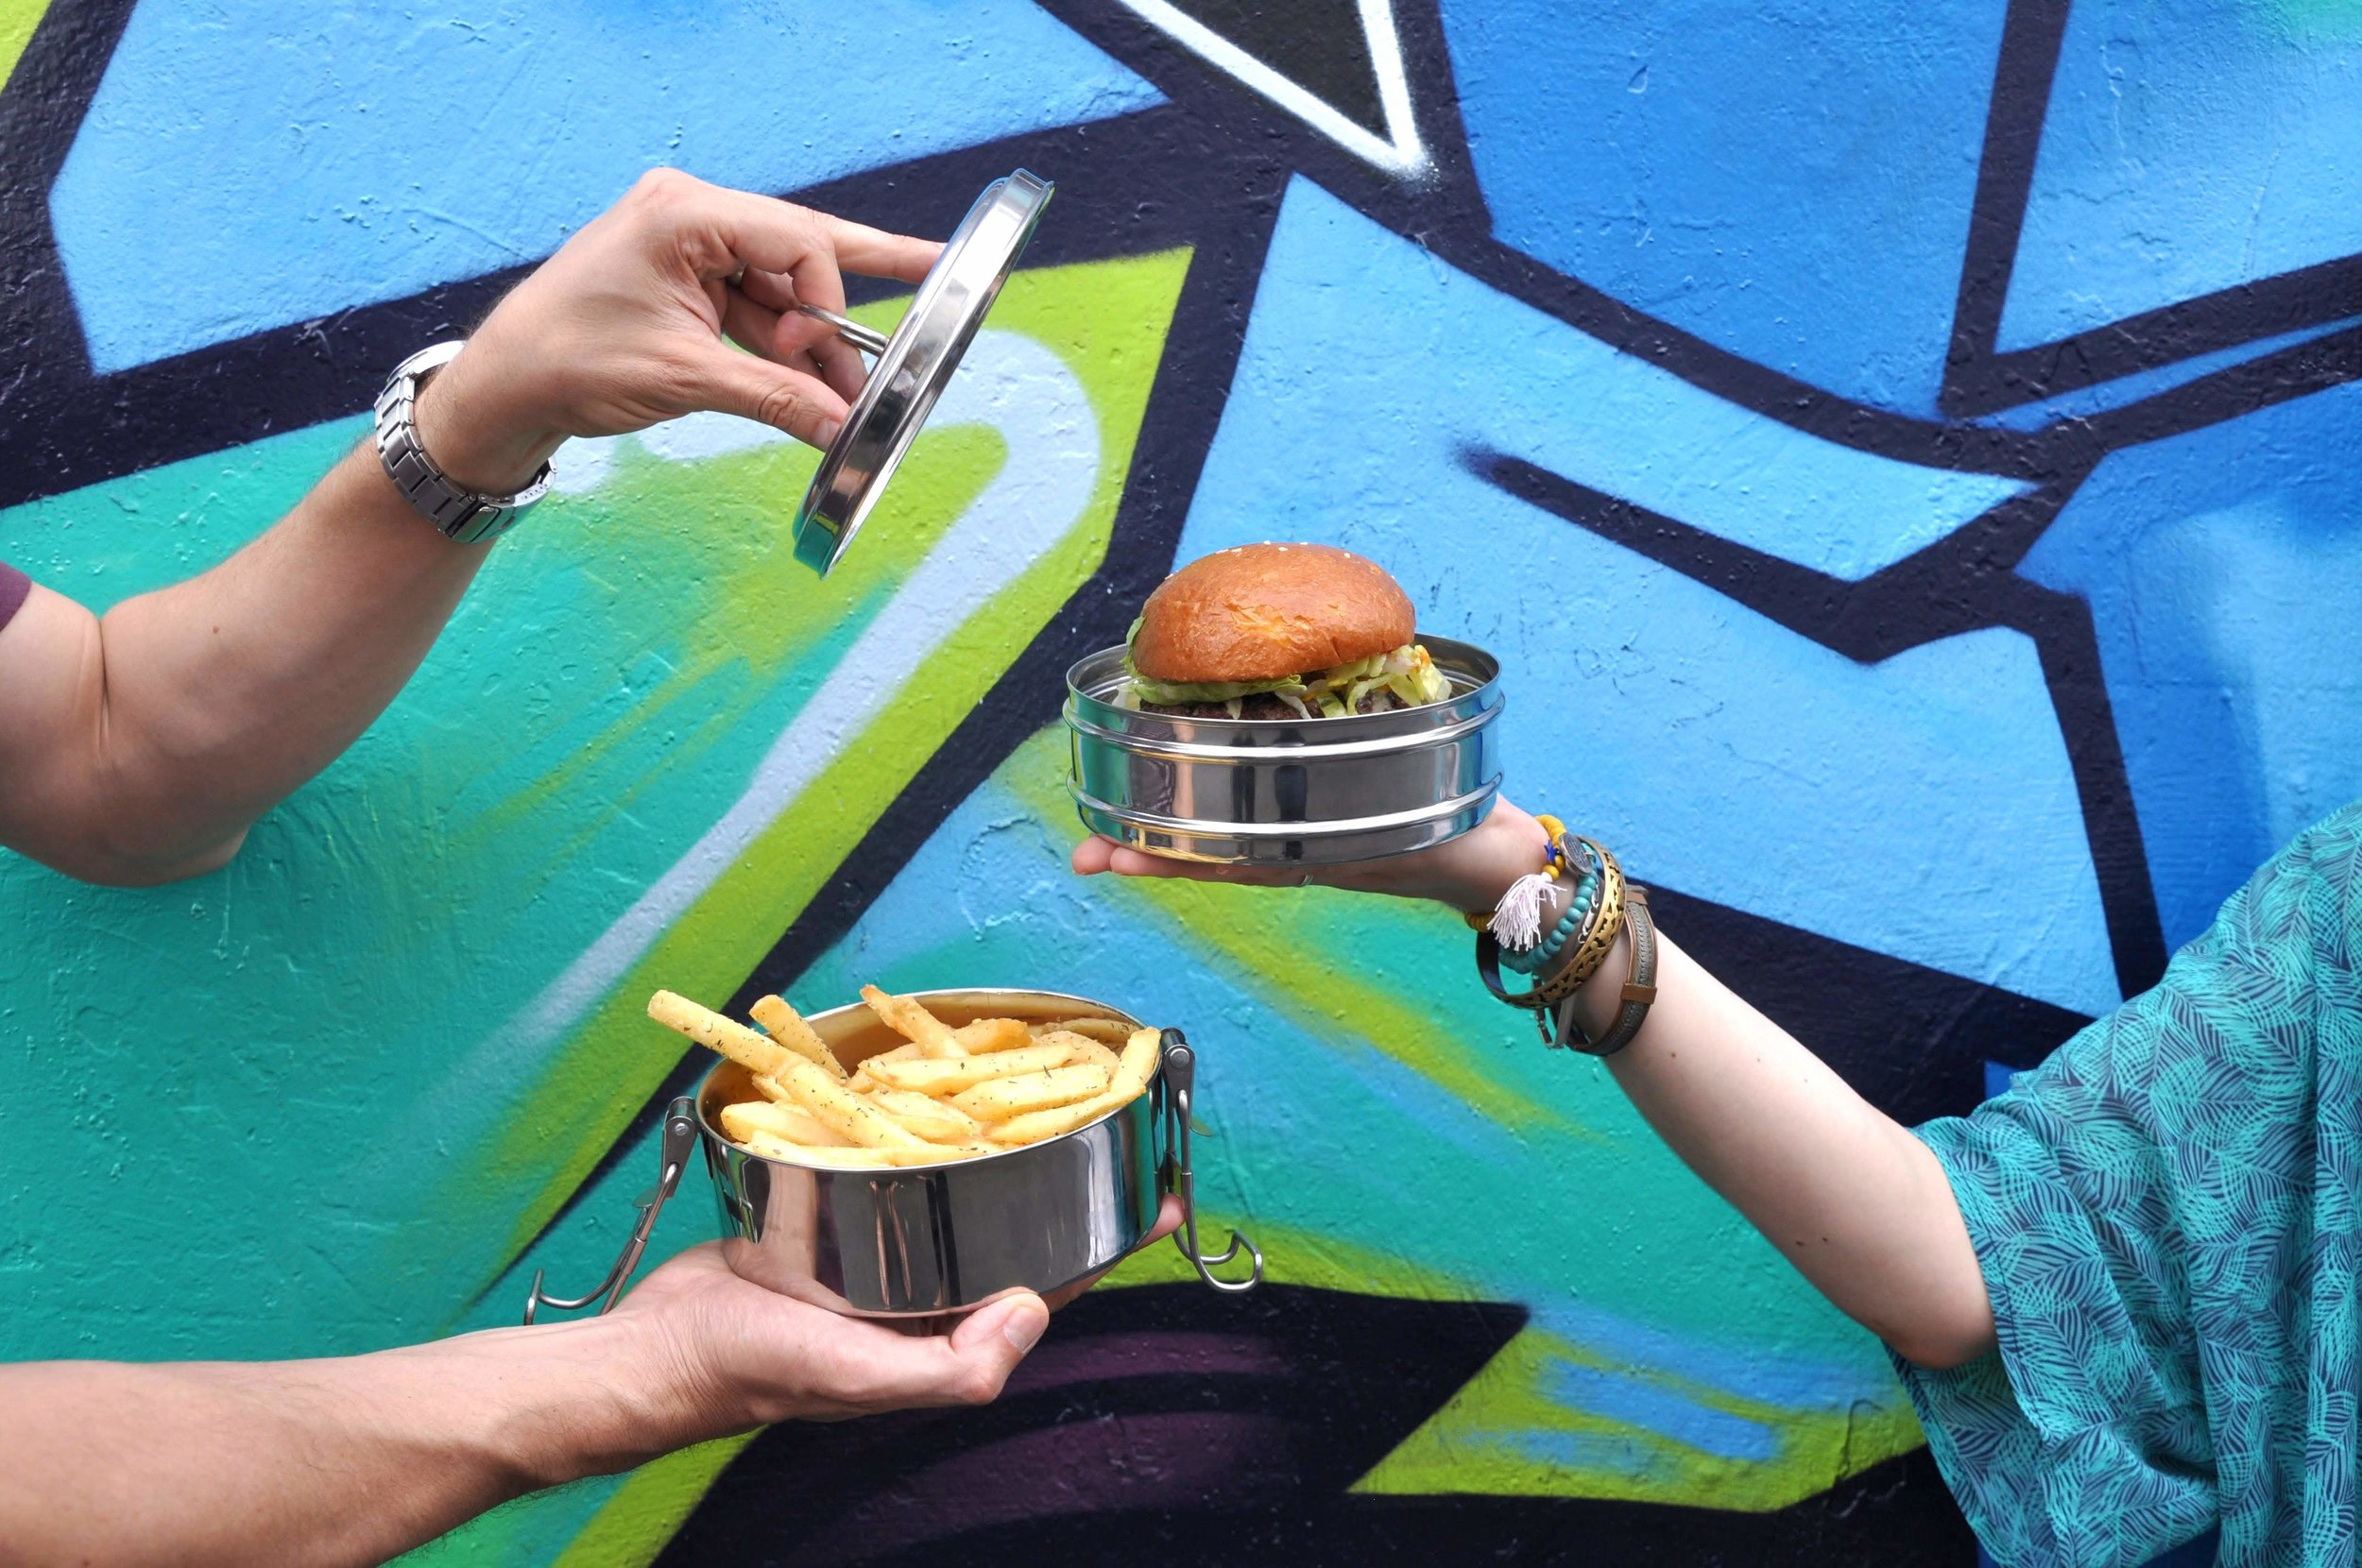 WEEK FIVE CHALLENGE: Get a takeaway meal waste free